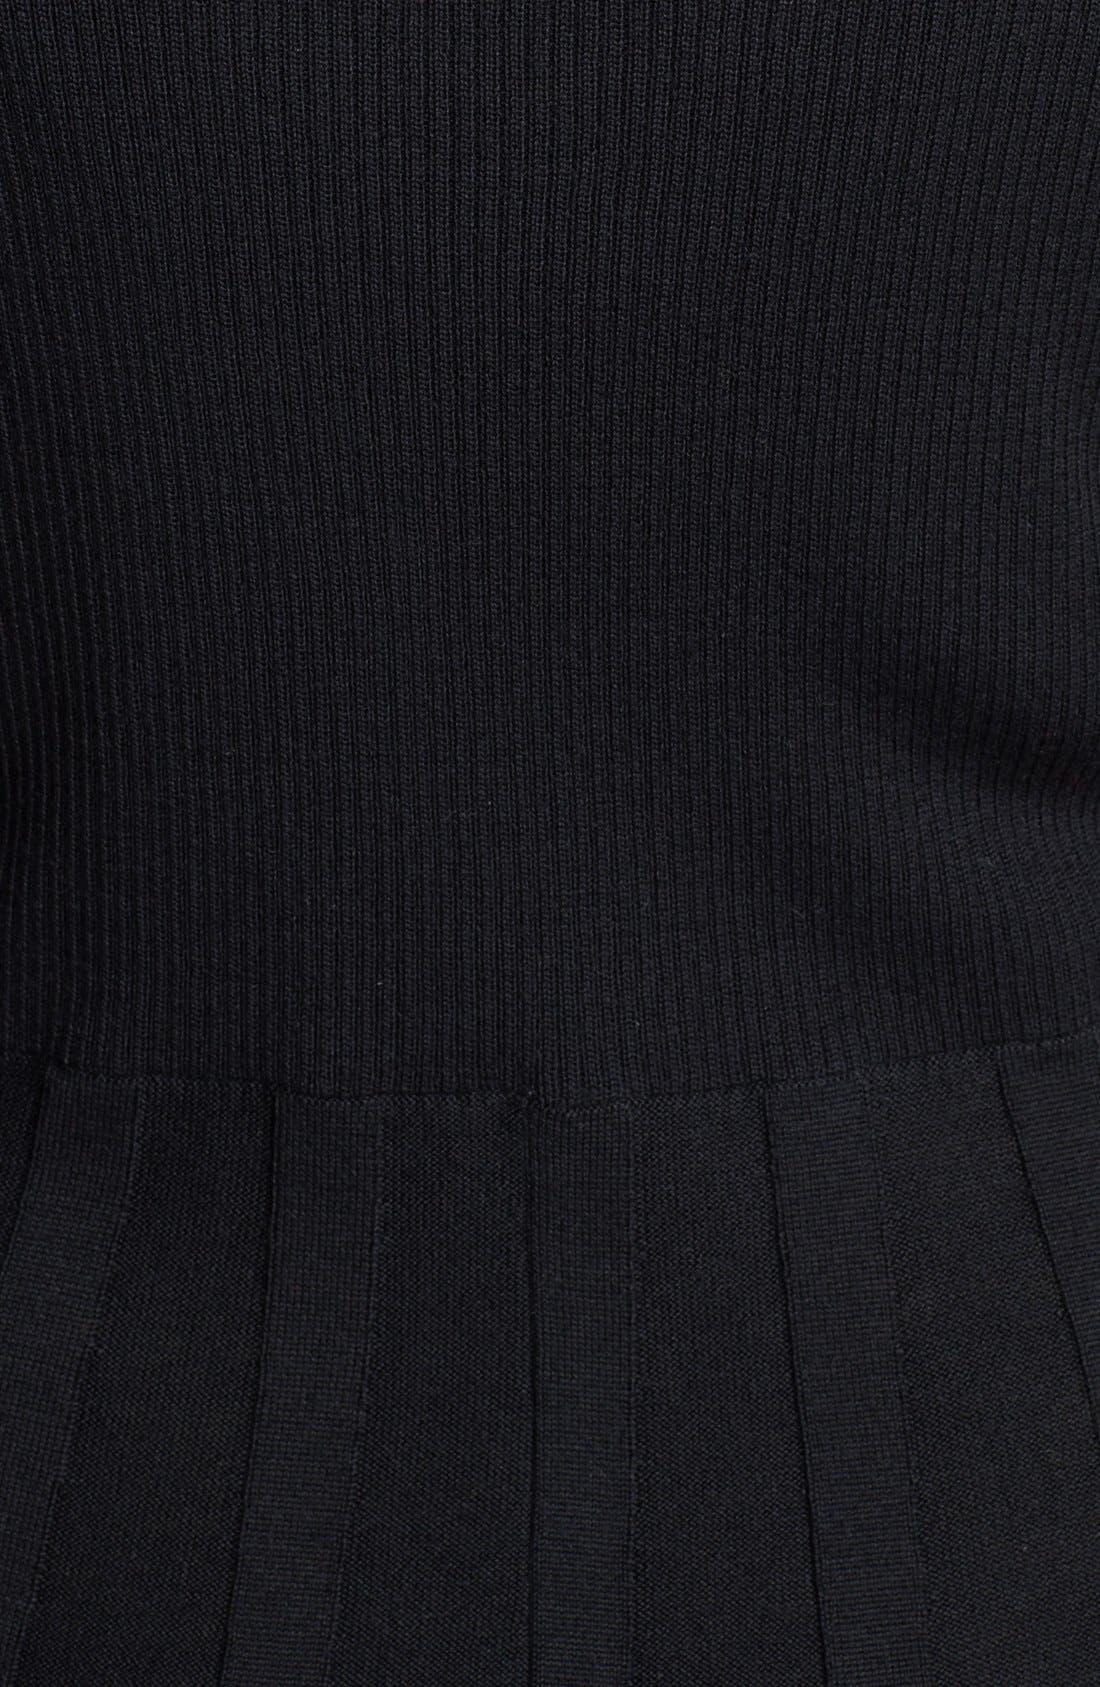 Alternate Image 3  - Calvin Klein Fit & Flare Sweater Dress (Plus Size)